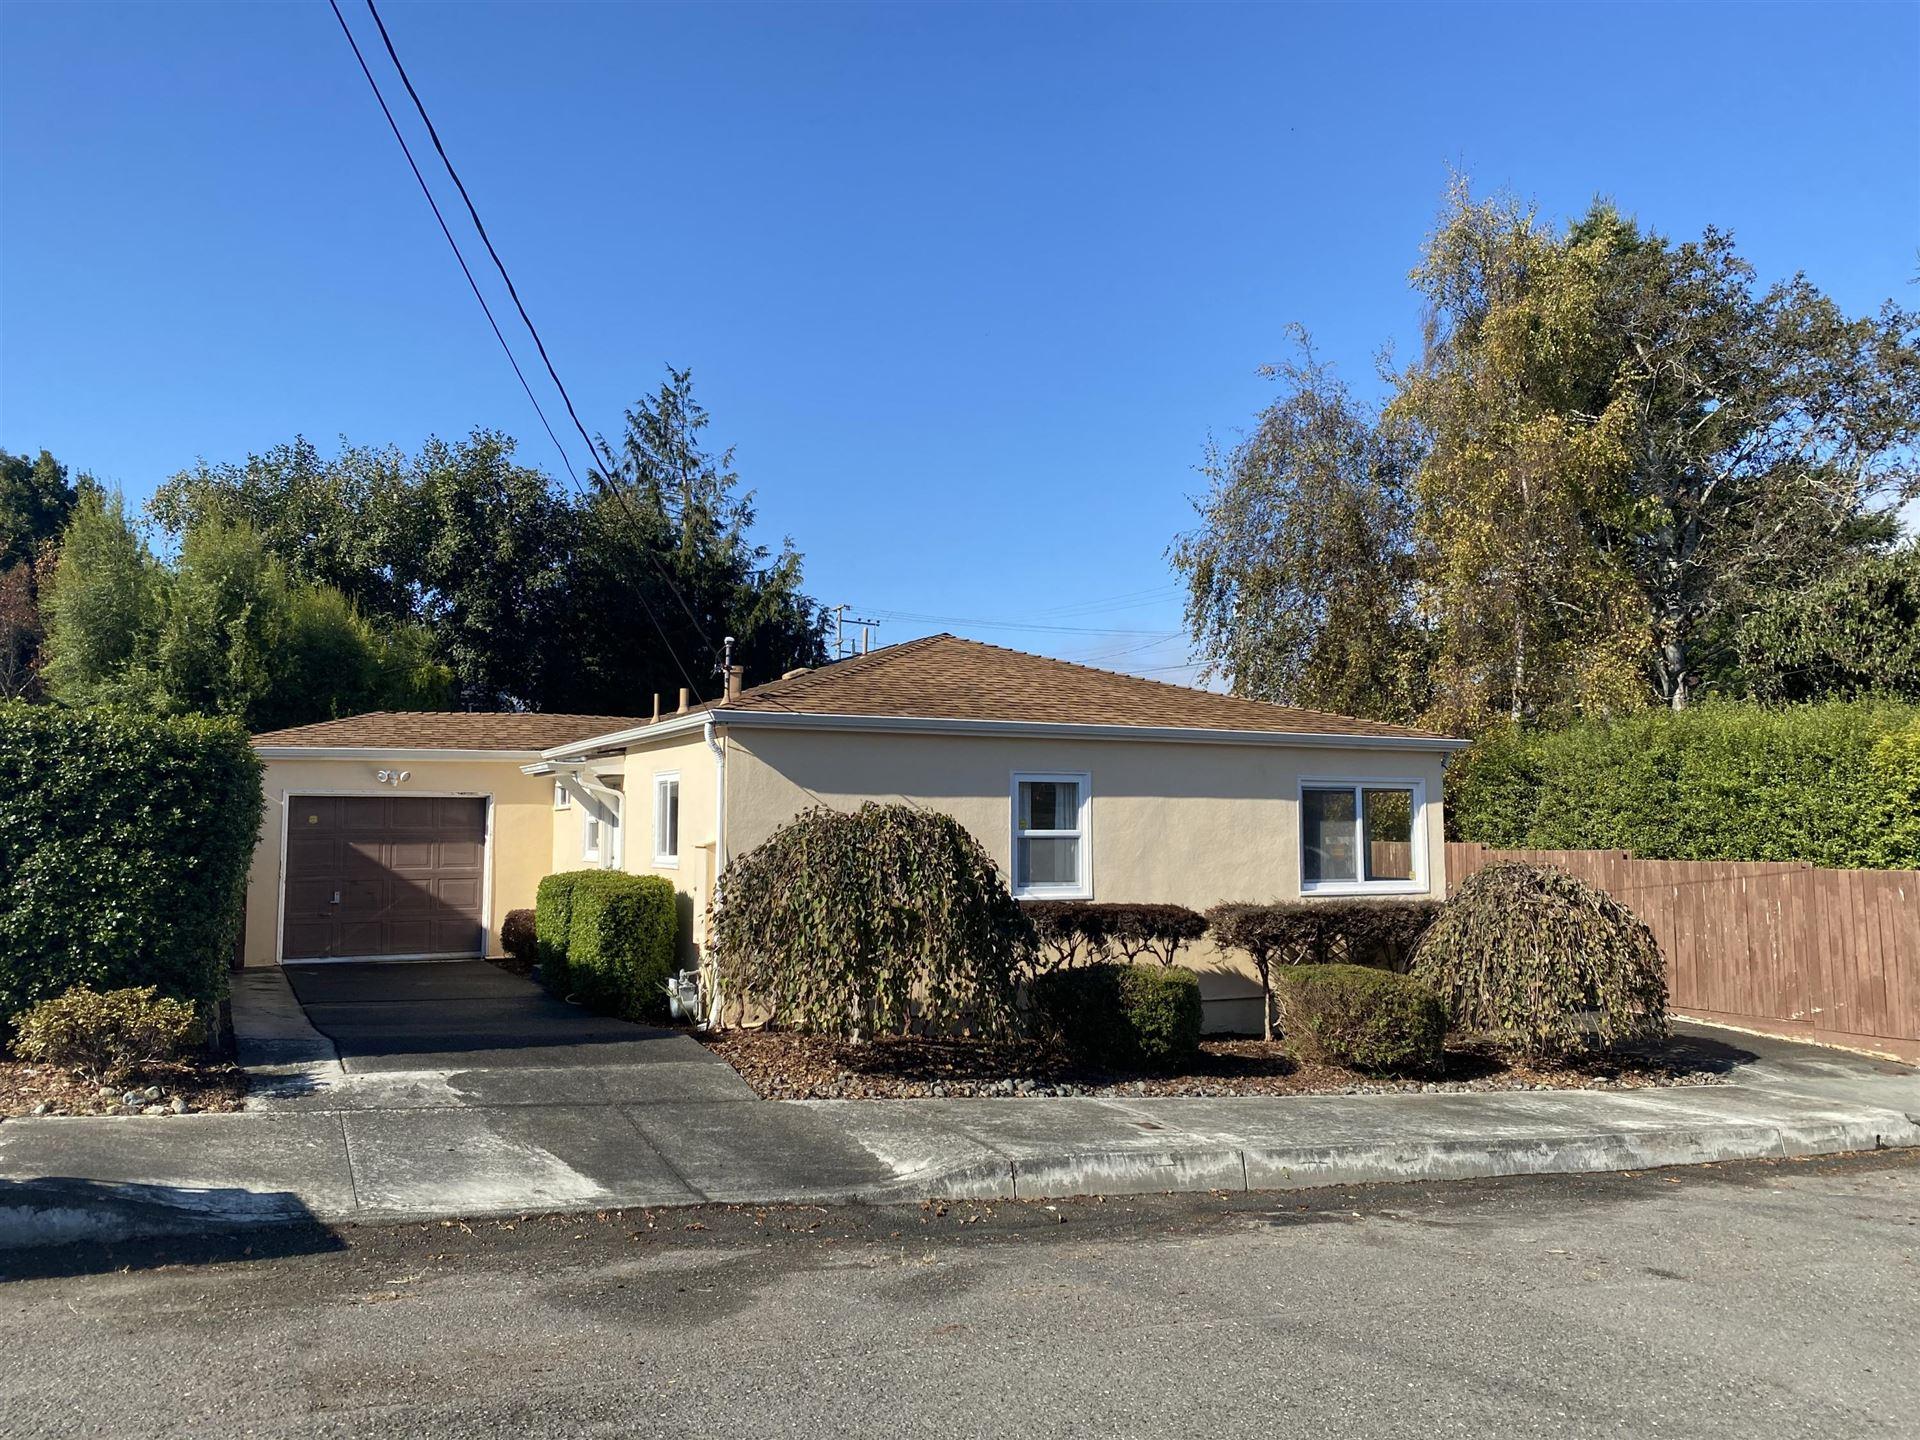 814 P Street, Eureka, CA 95501 - MLS#: 257719